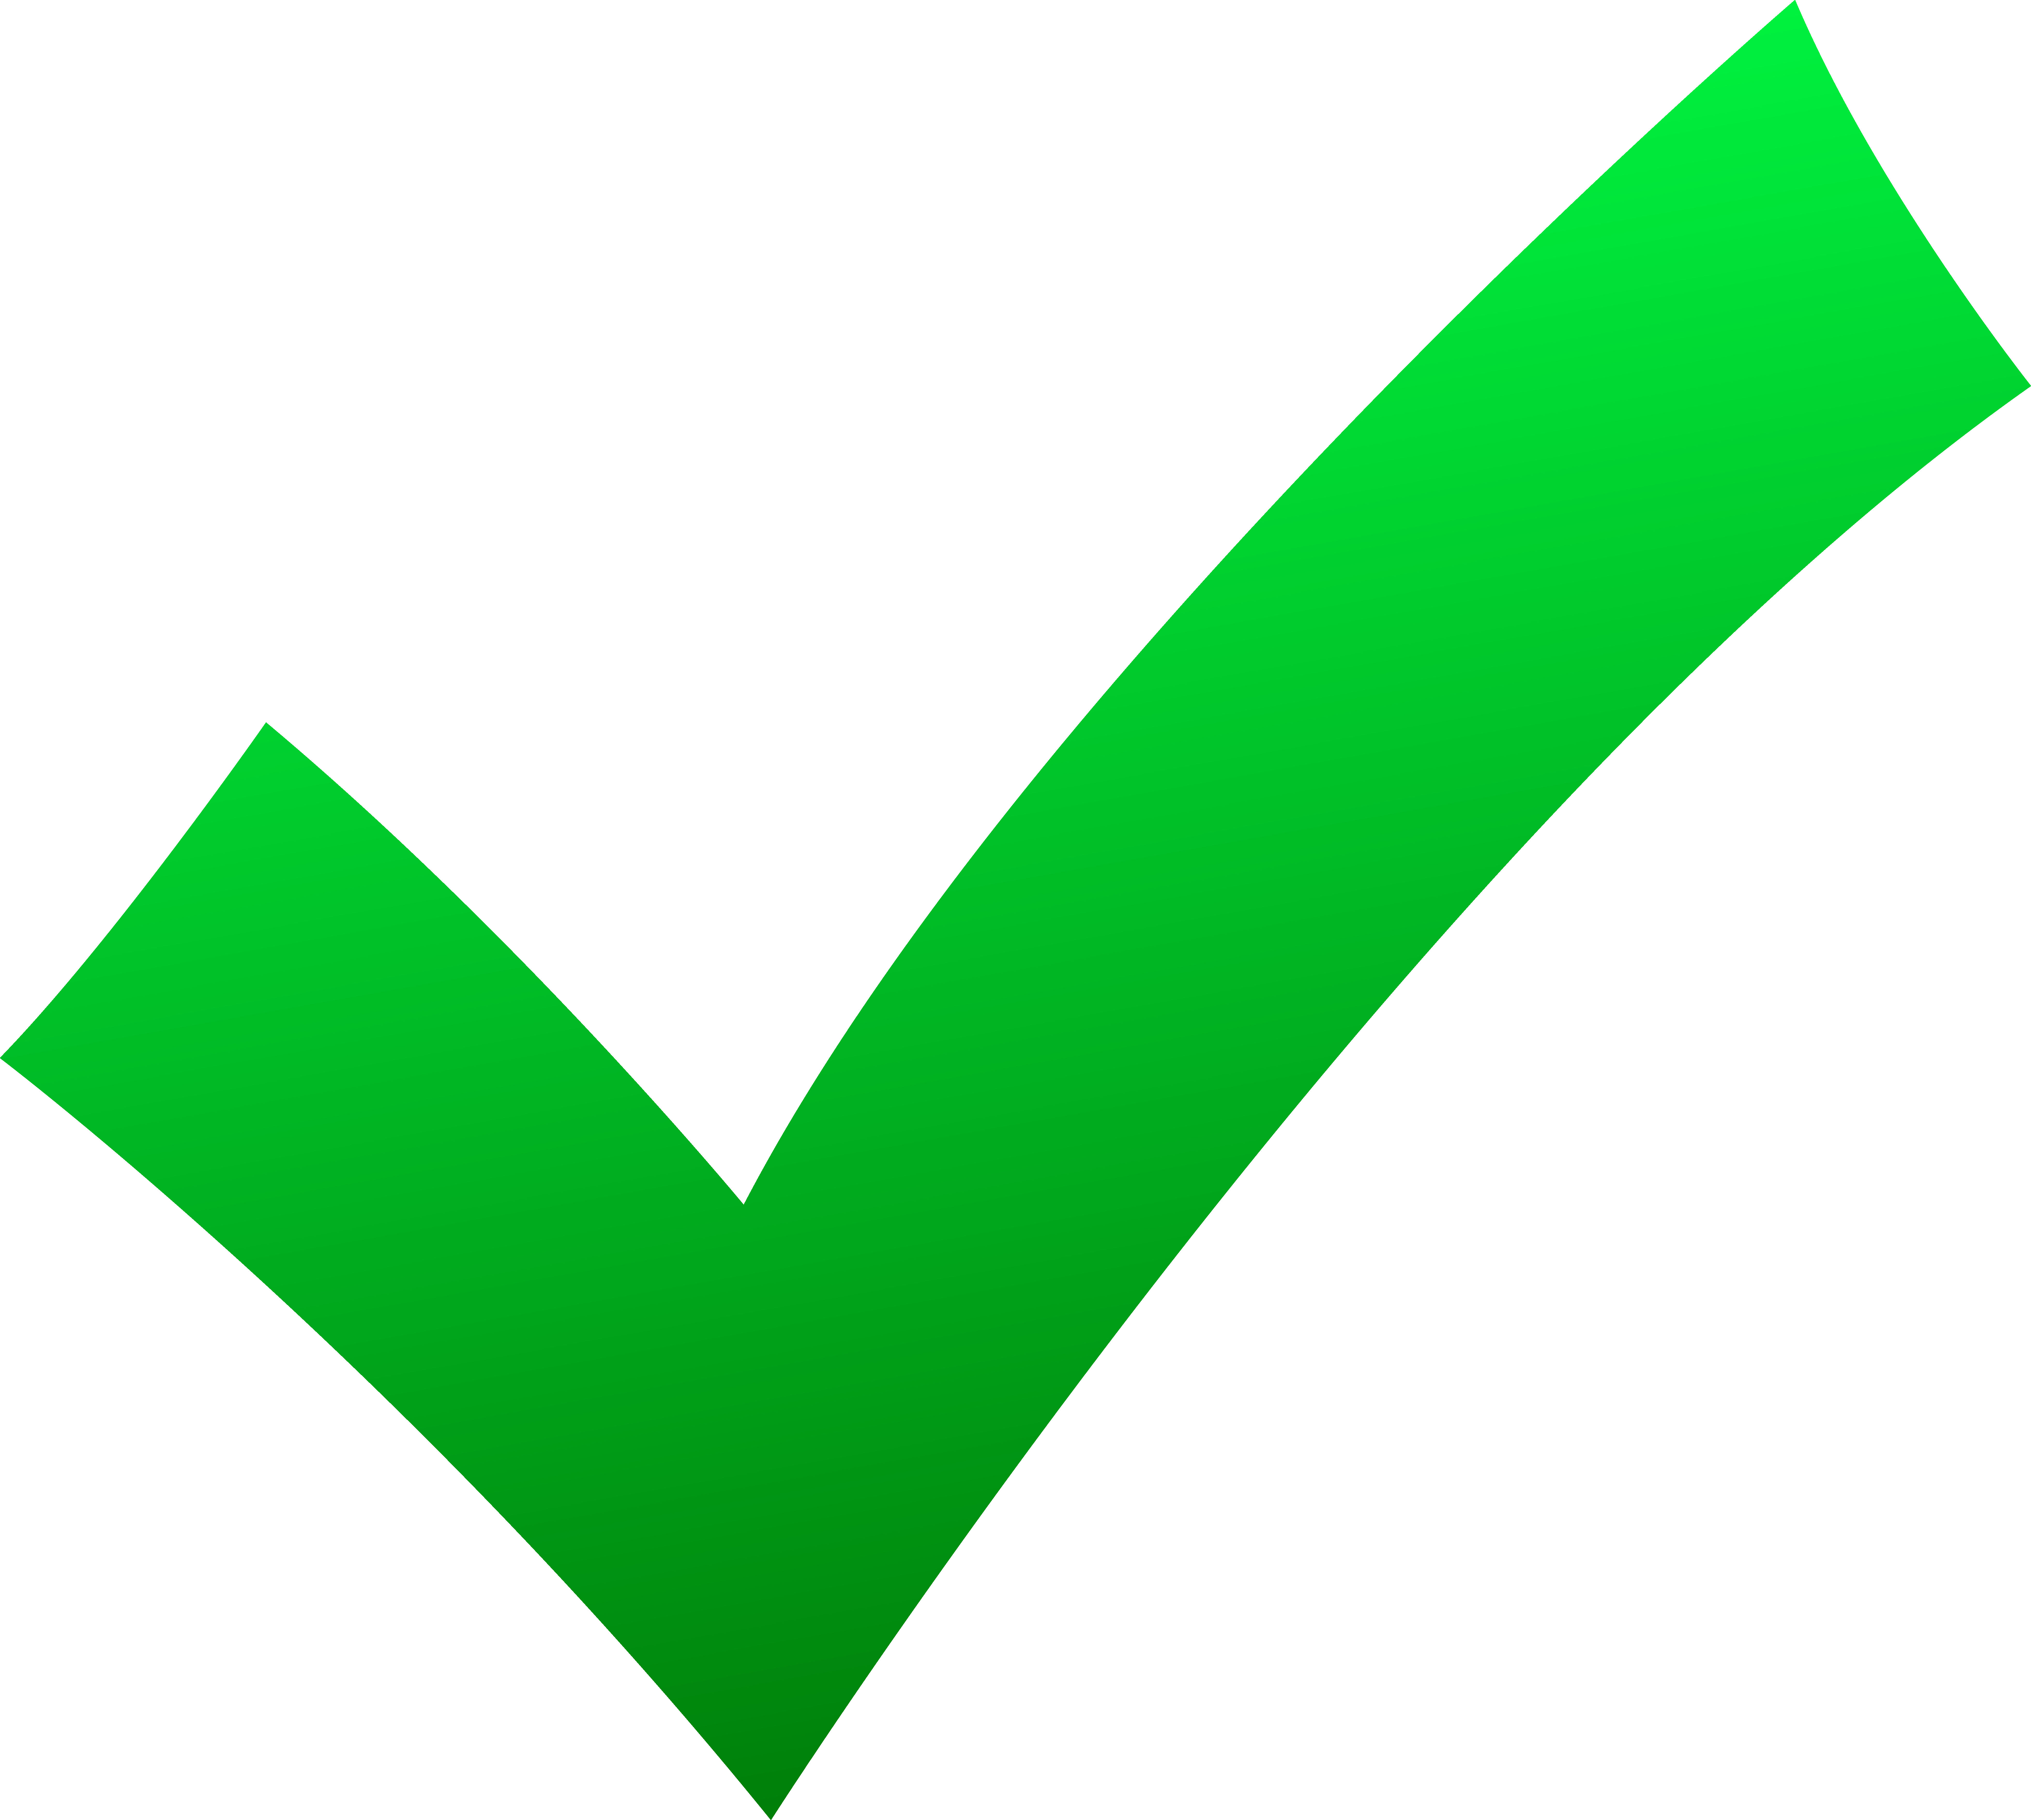 7855x7040 Simple Green Check Mark